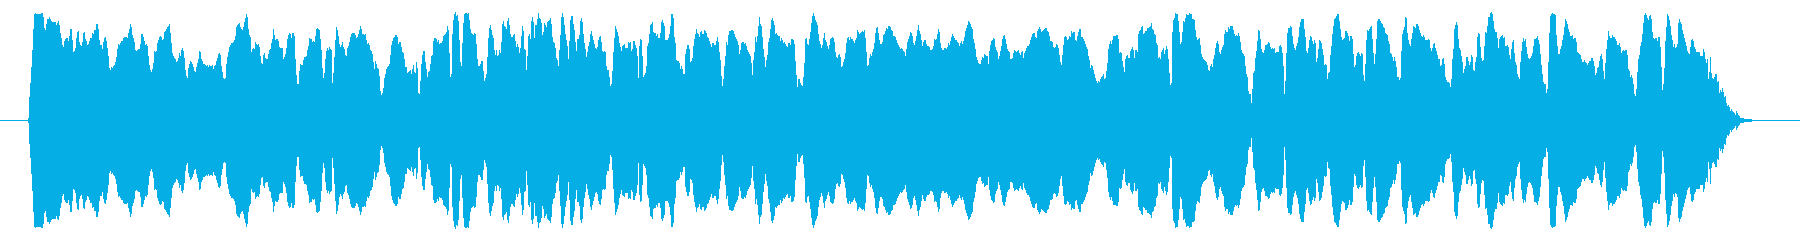 8bitパワーU-D-01-5_dryの再生済みの波形